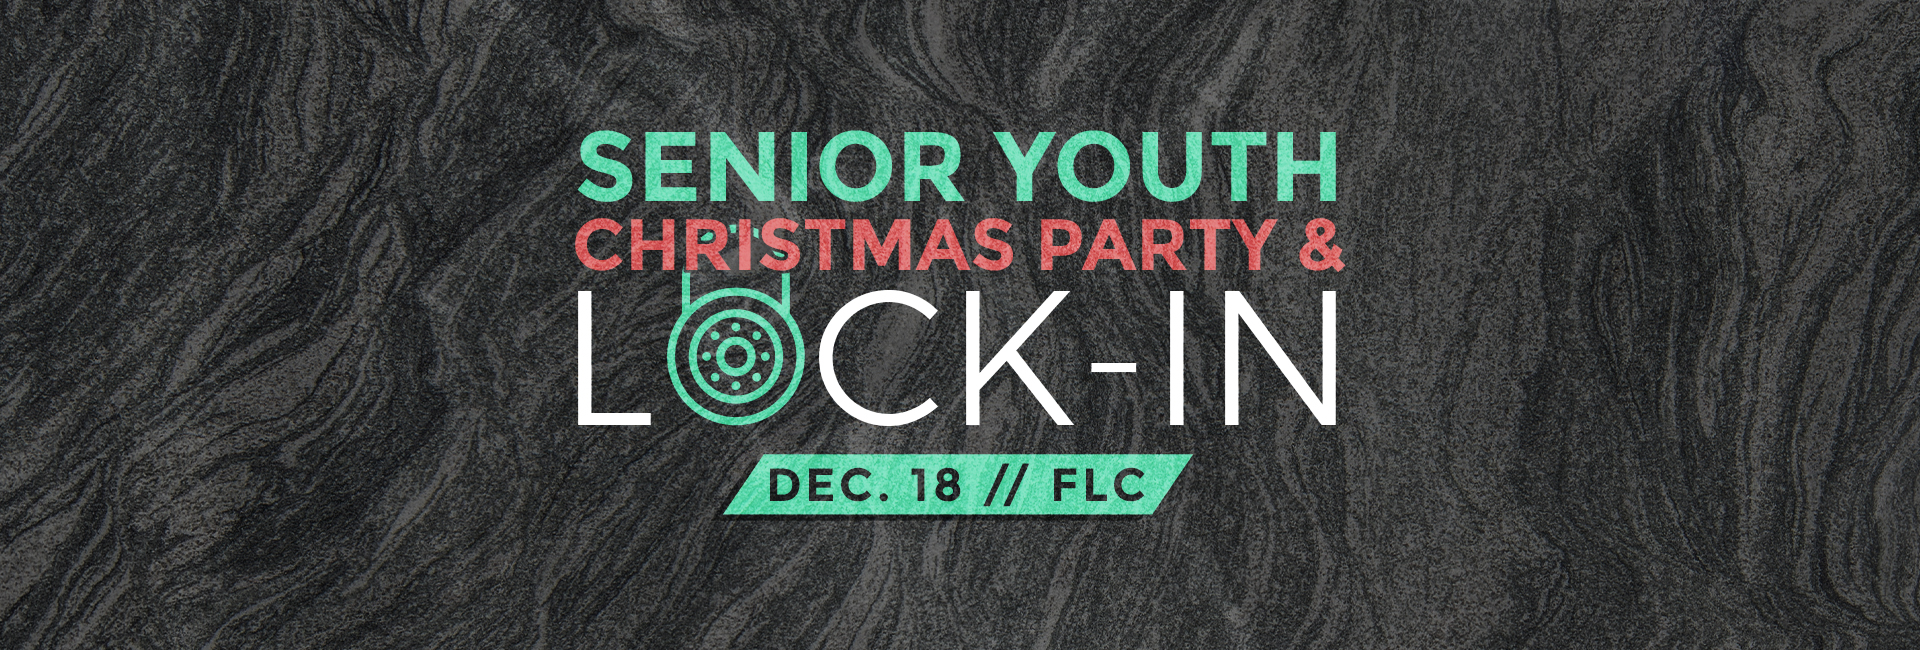 Christmas Lock Inn Web